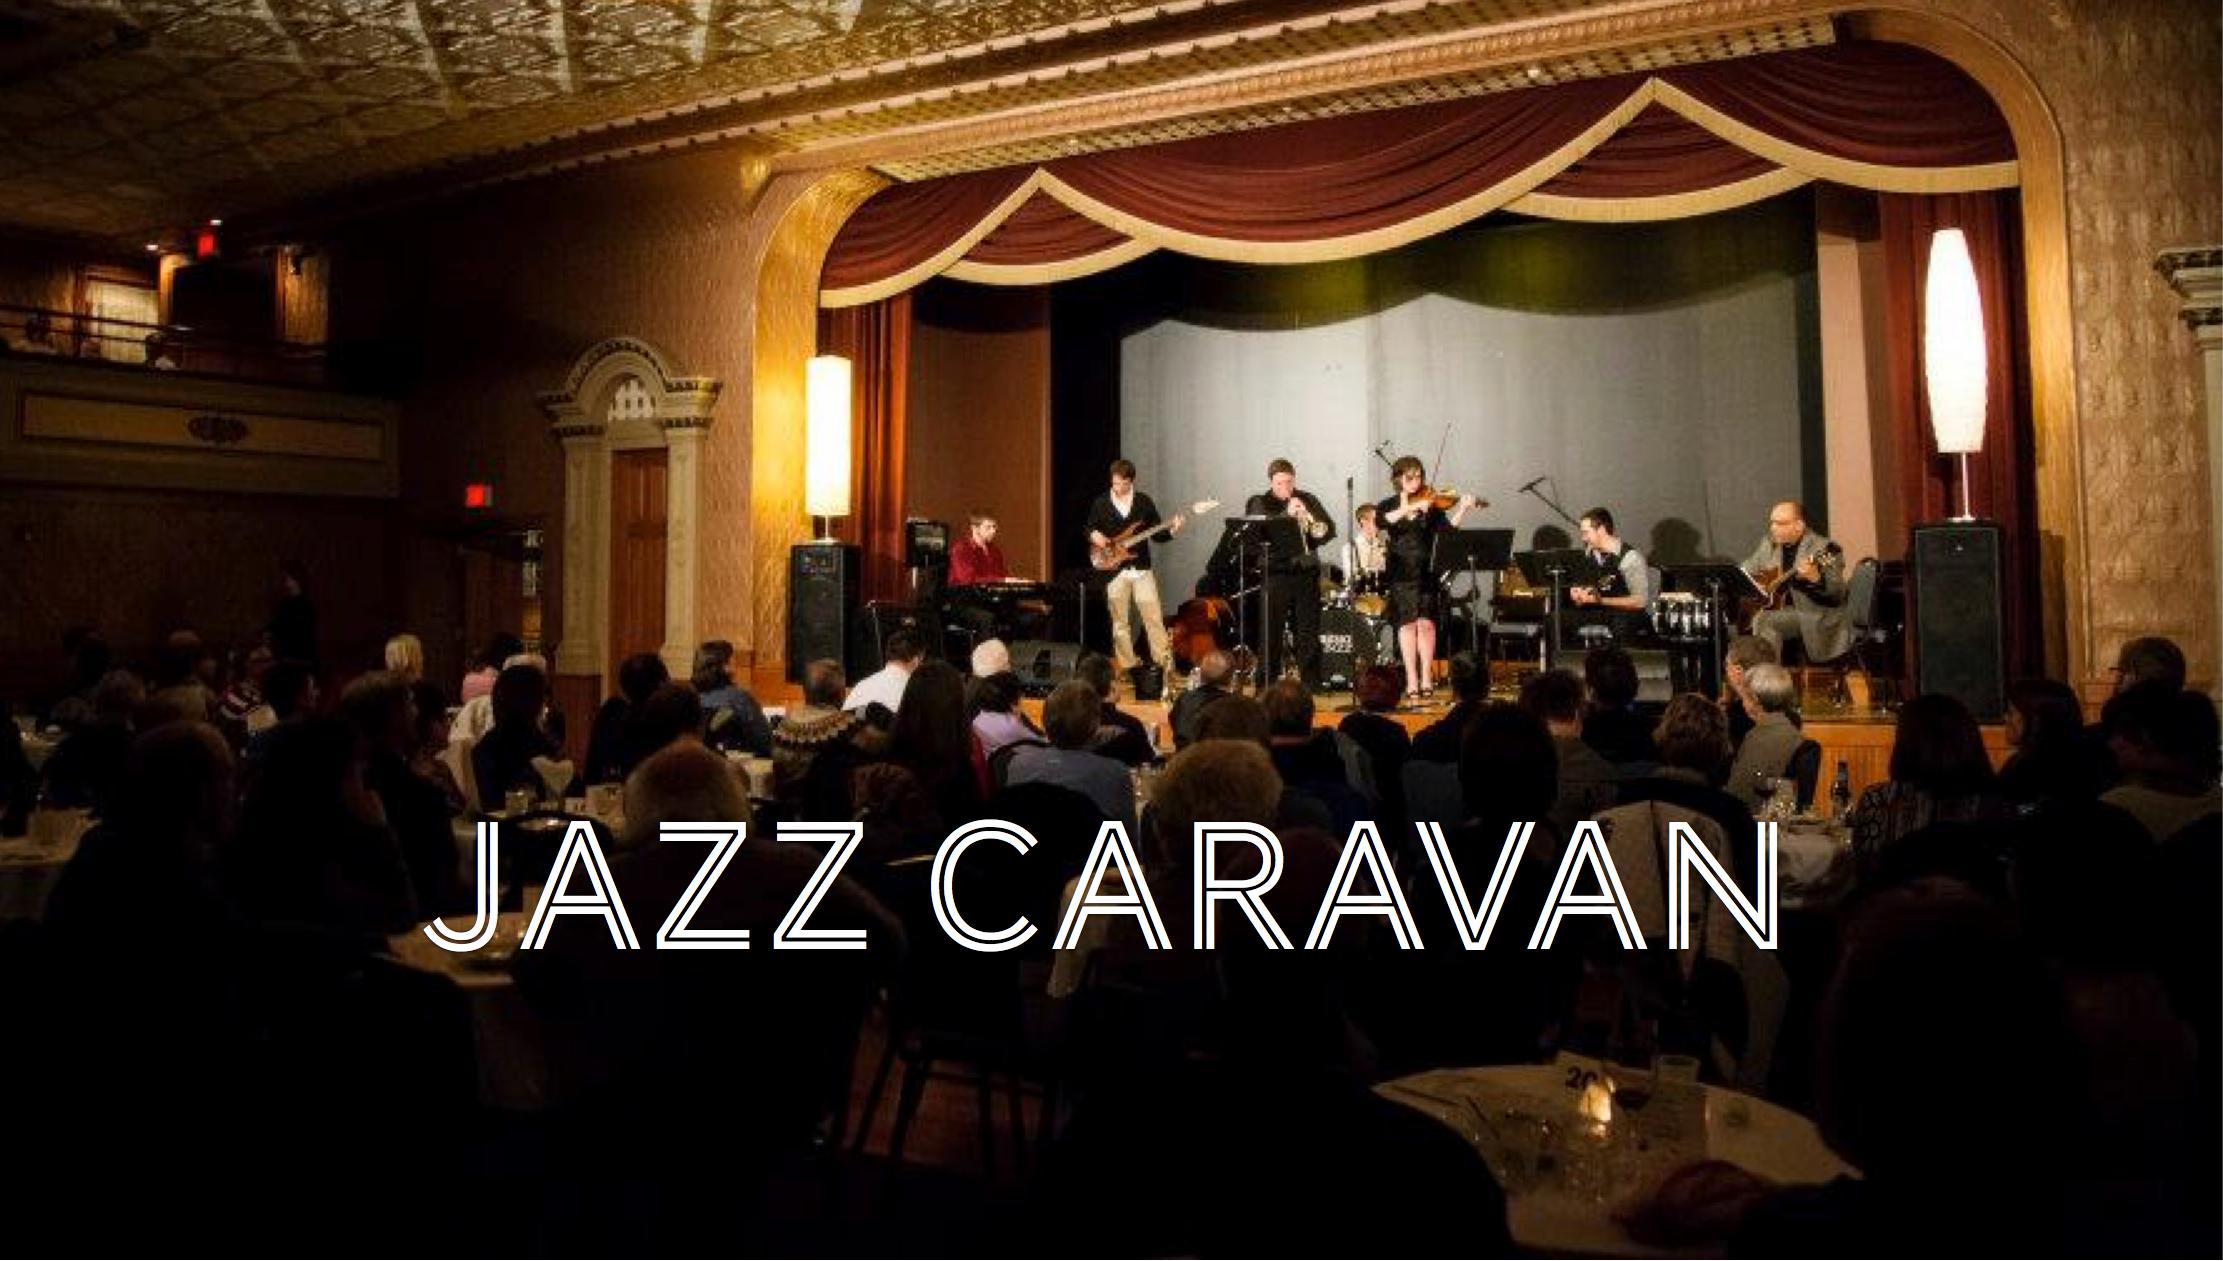 jazz caravan.jpg